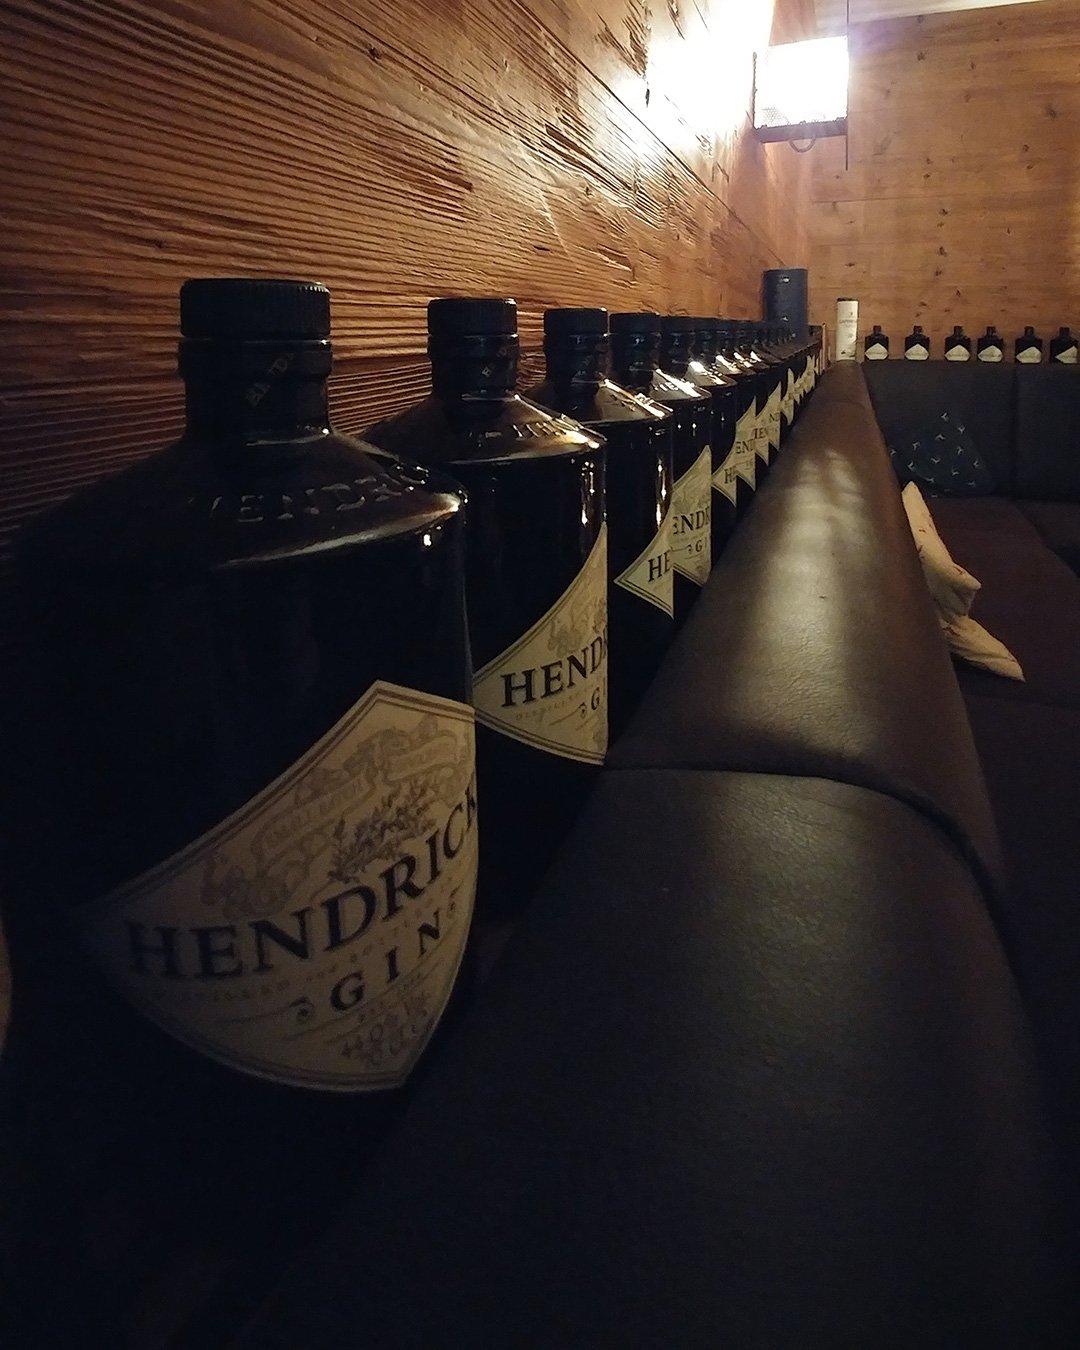 Ginflaschen in der Platzl-Bar, Hotel 3Quellen-Therme, Bad Griesbach, Wellness, Conny-Doll-Lifestyle